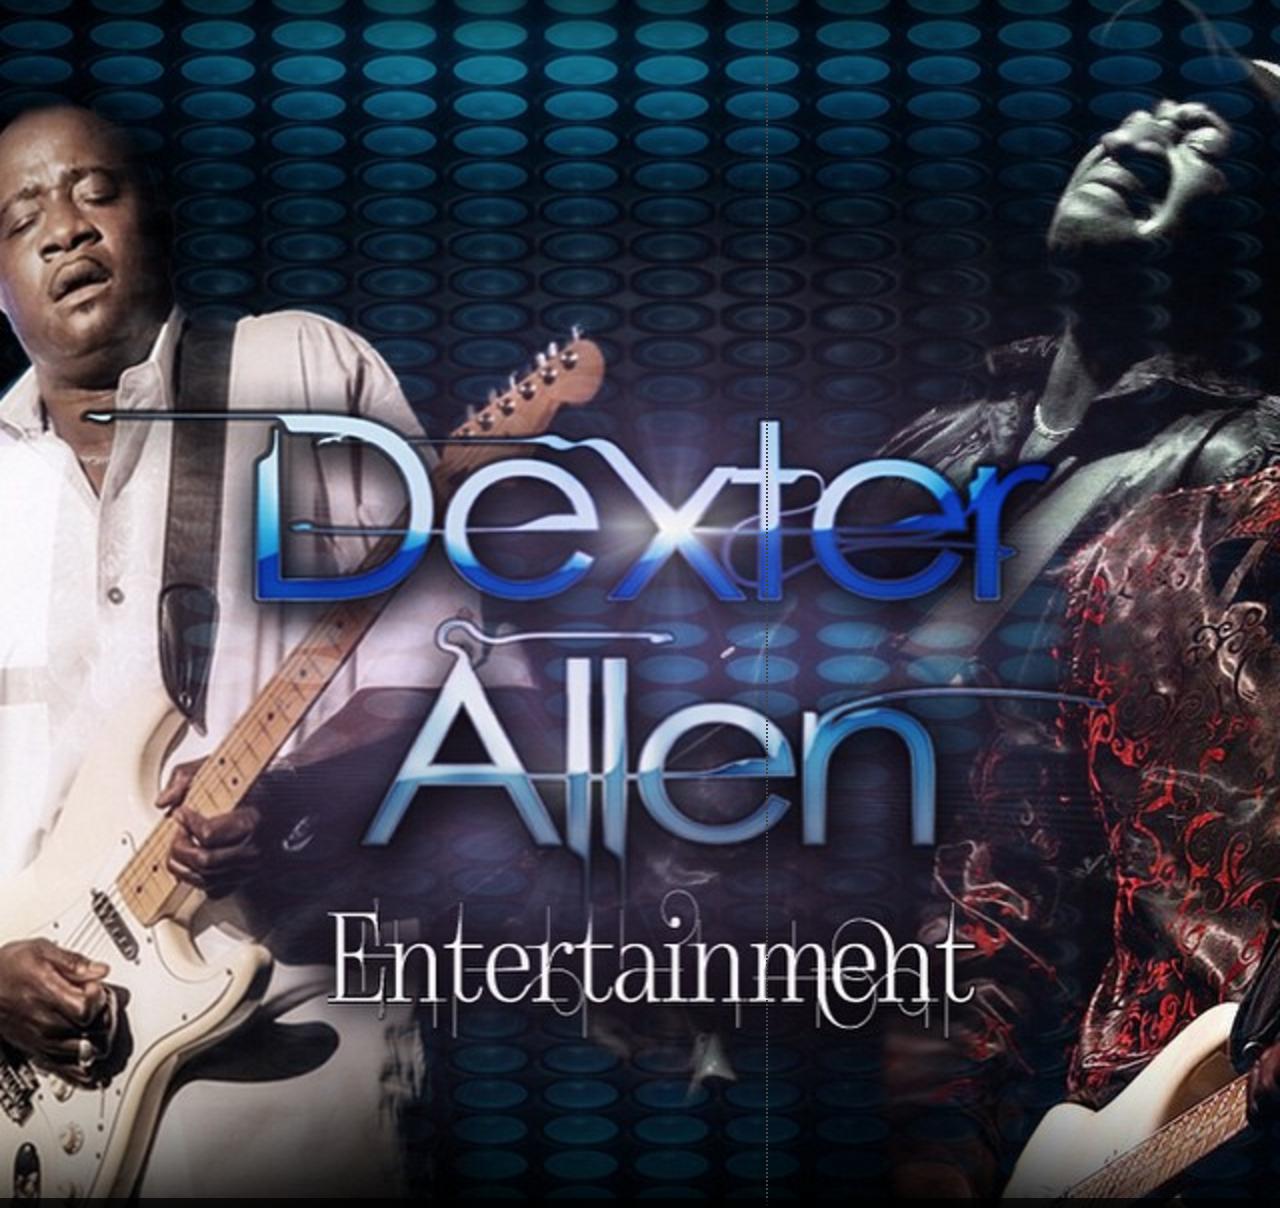 Dexter Allen Entertainment